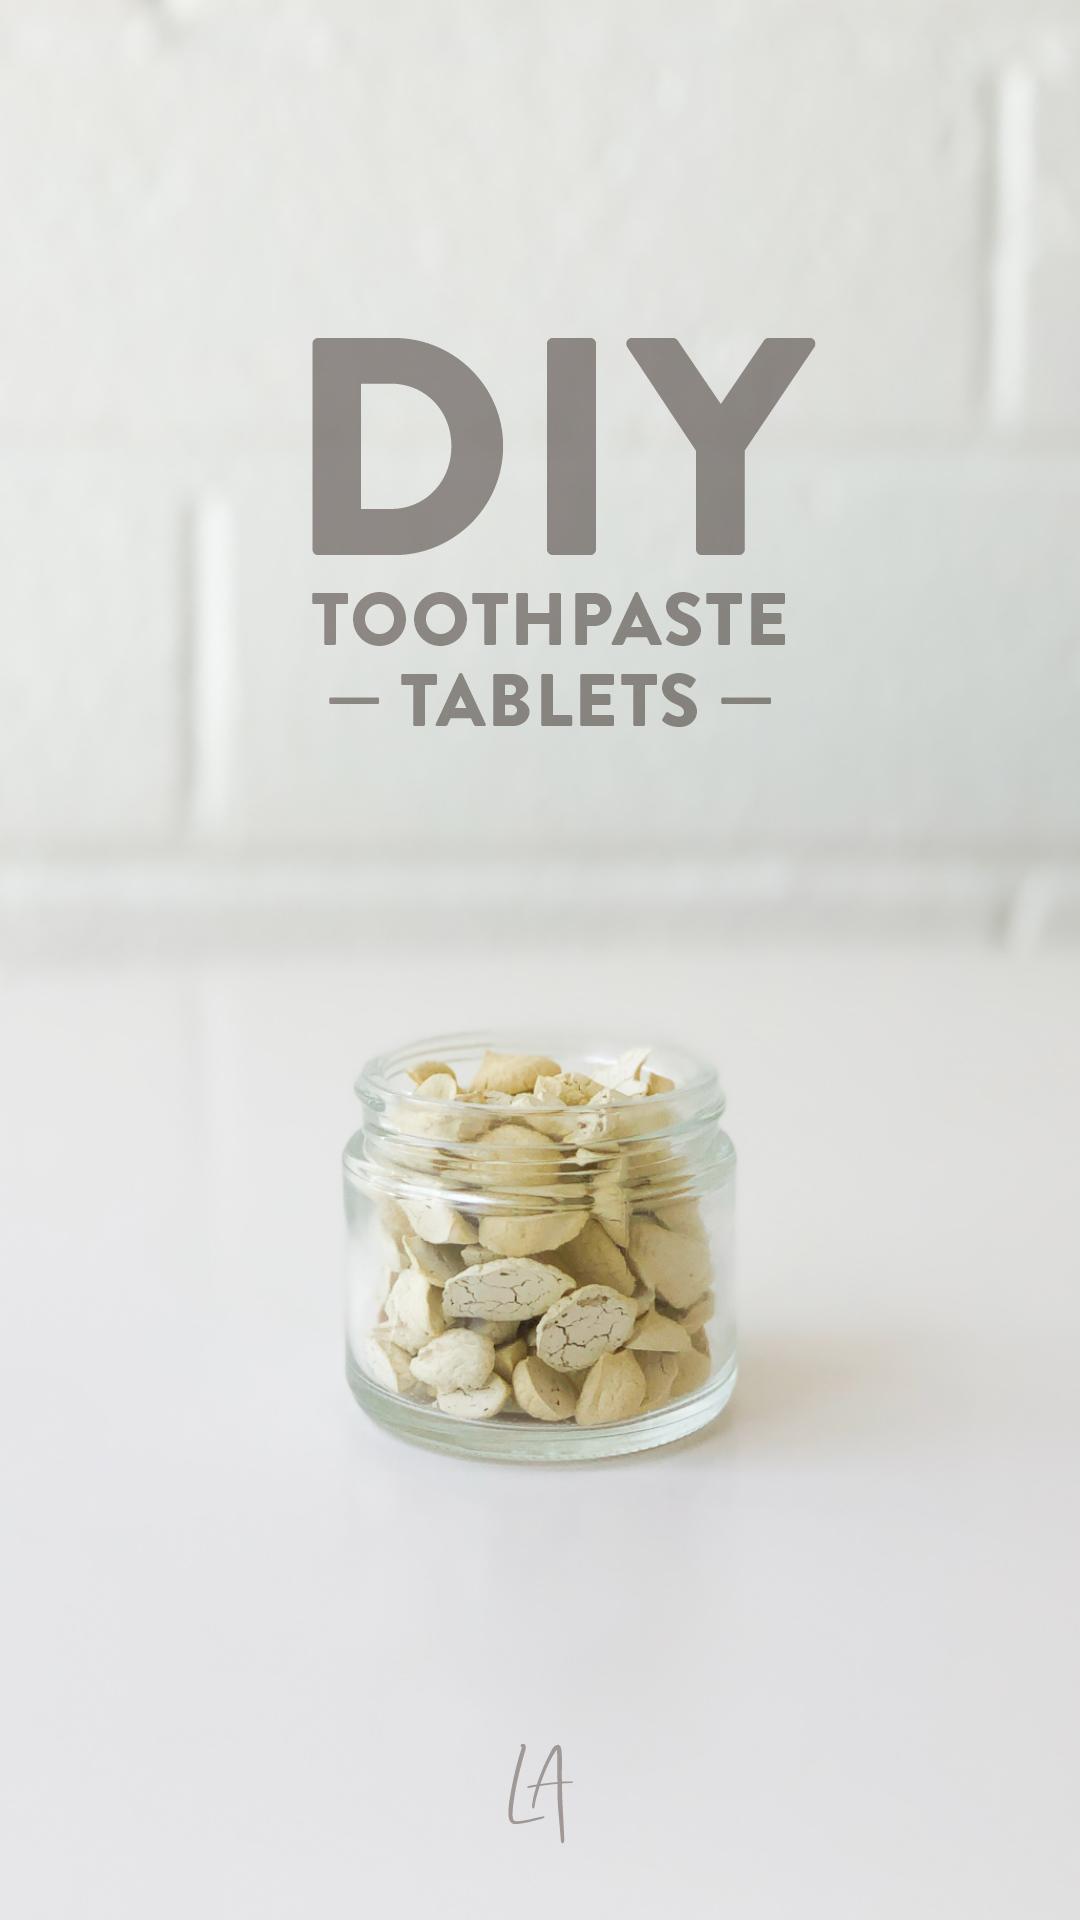 DIY Toothpaste tablets recipe